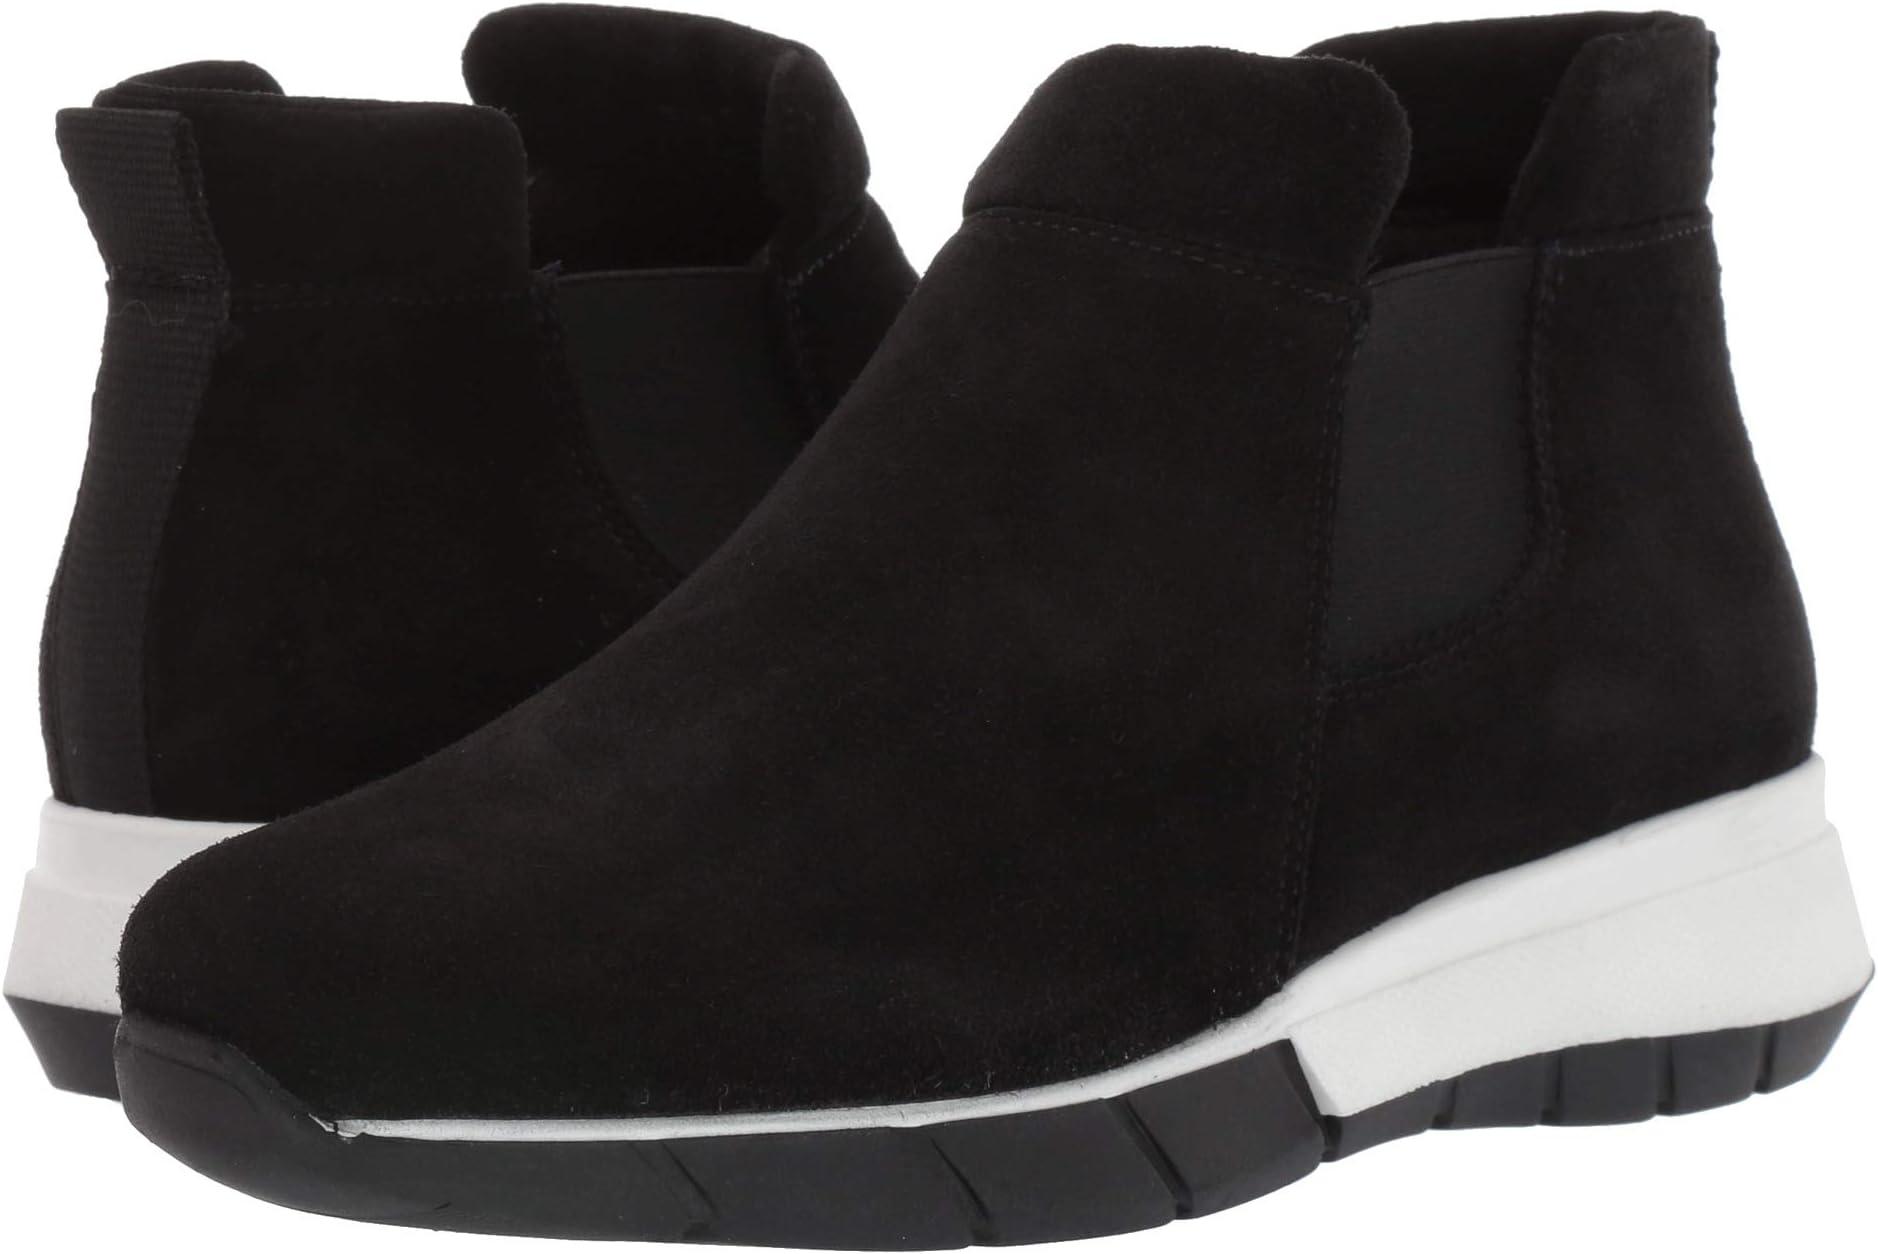 TC-1-Sneakers-2019-09-11